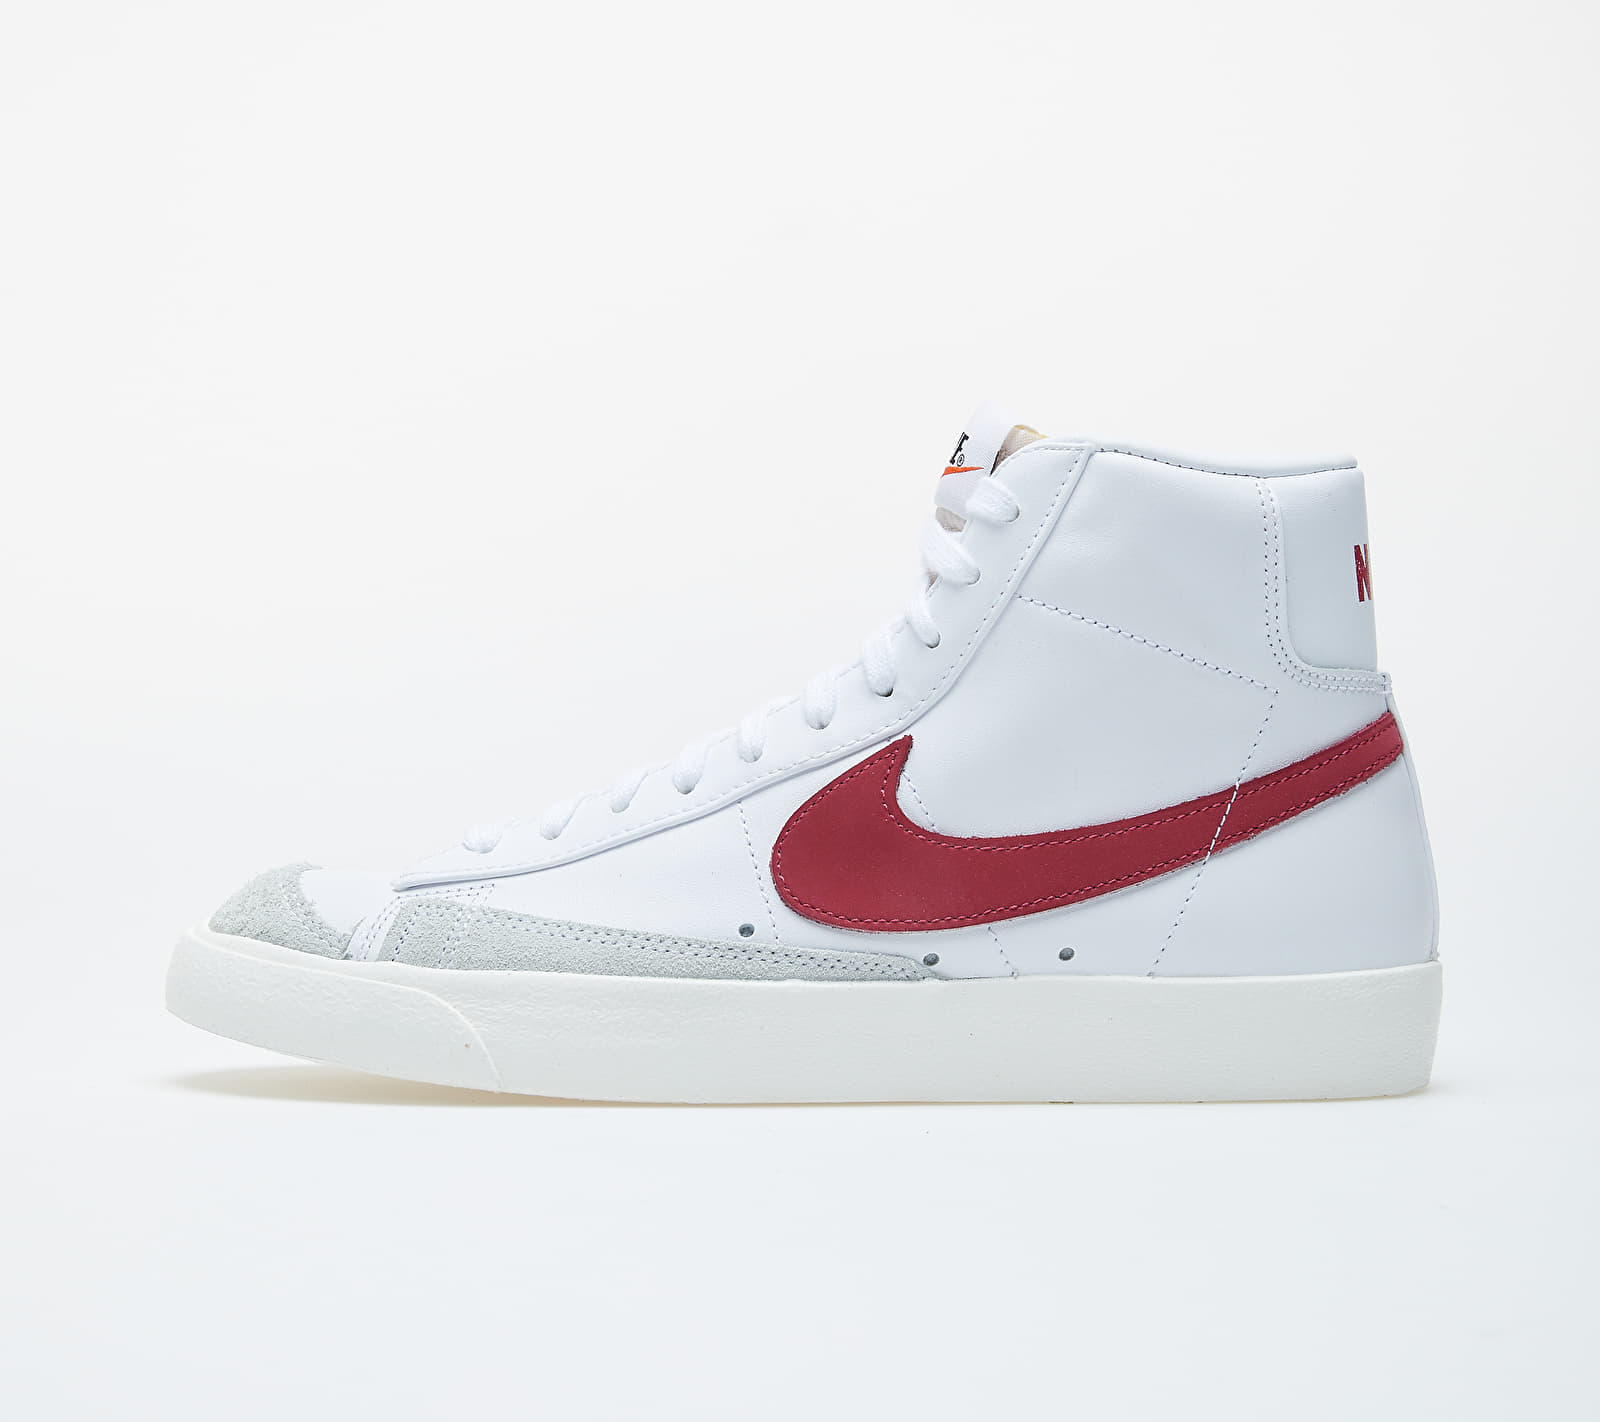 Nike Blazer Mid '77 Vntg White/ Worn Brick-Sail BQ6806-102